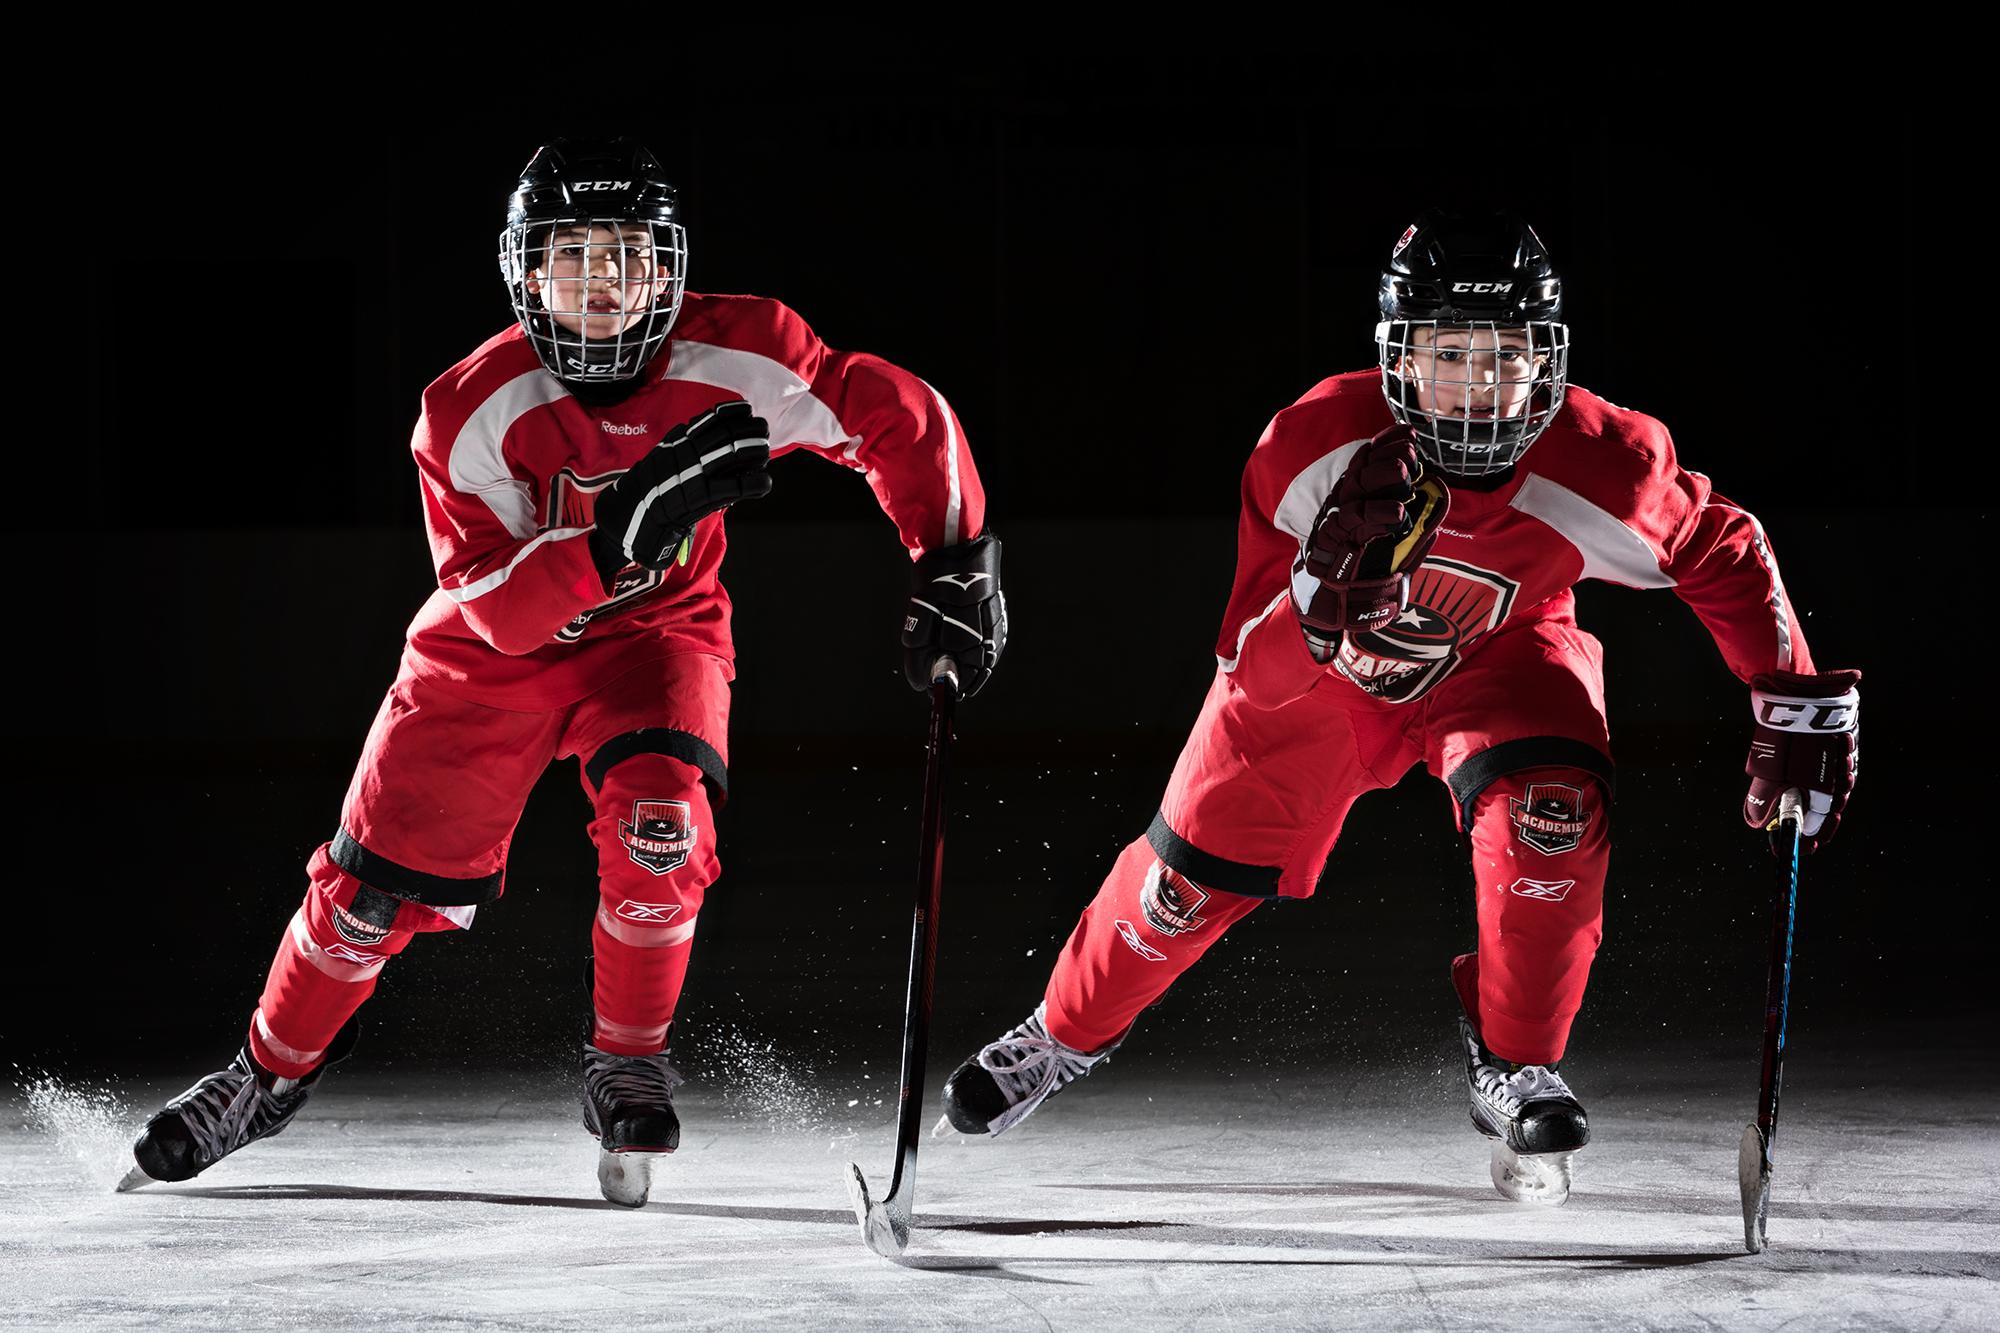 petits hockeyeurs qui patinent vers la caméra